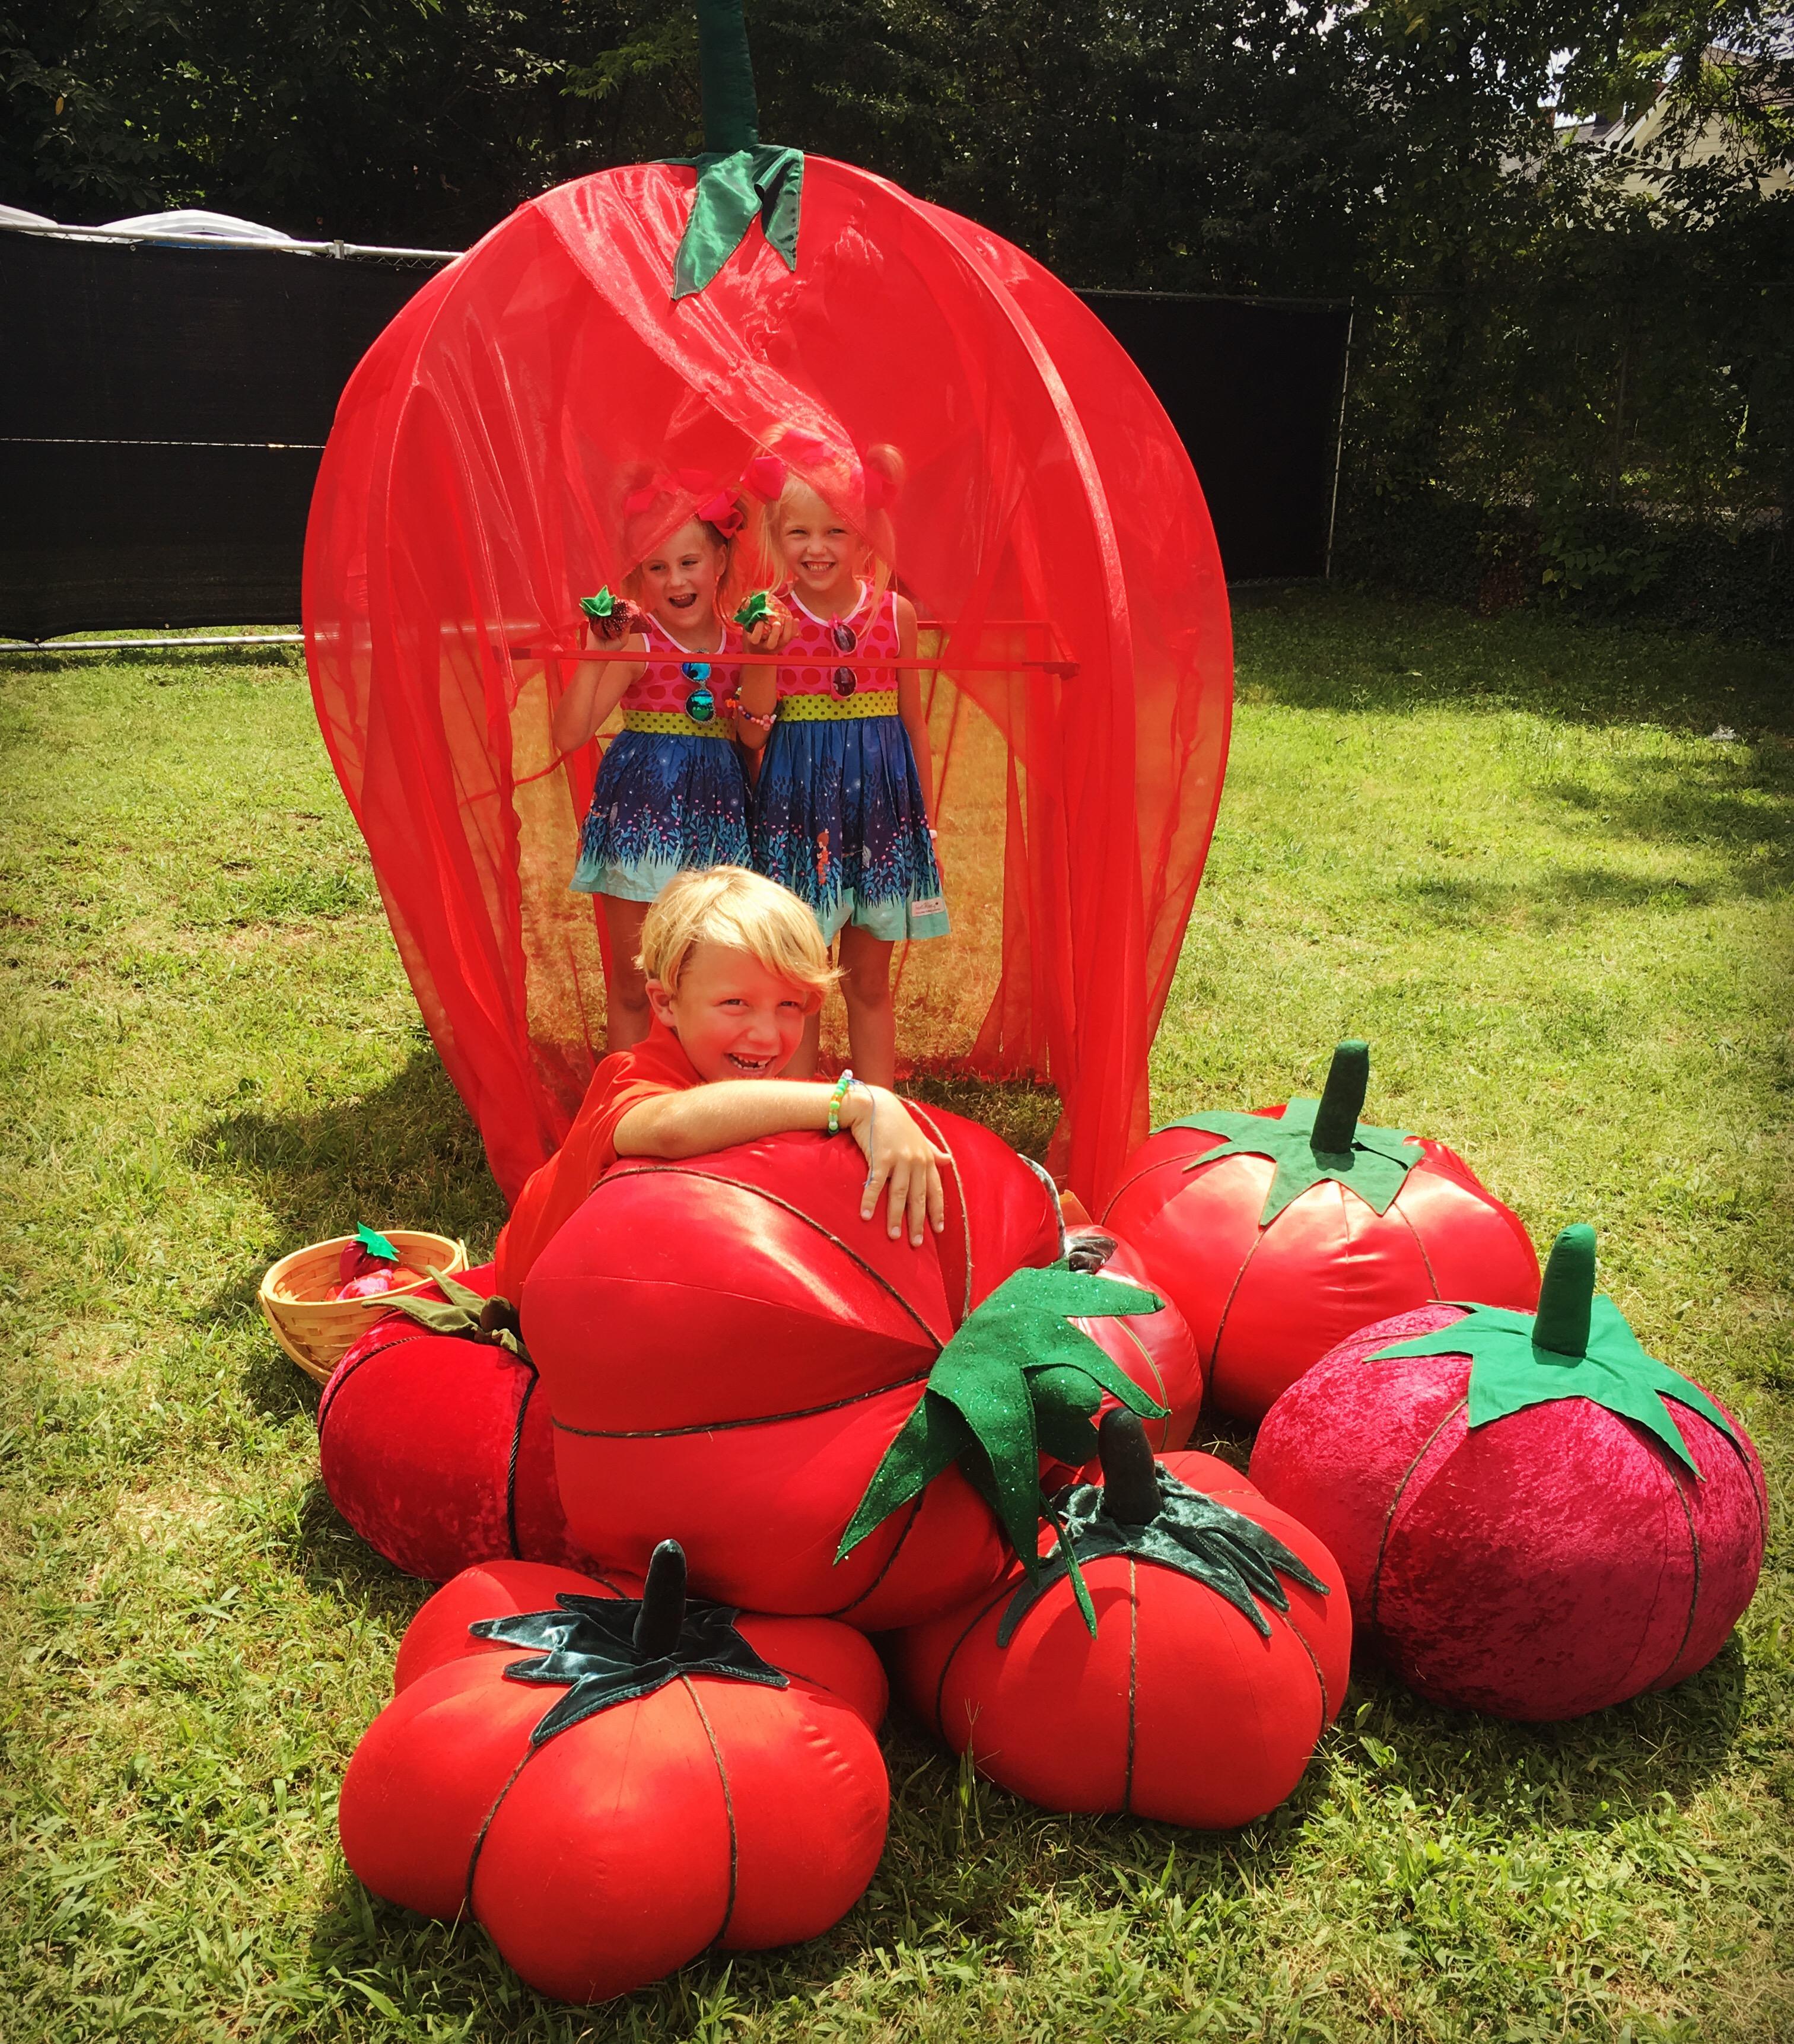 Reitmeyer_TomatoArtFest_2019a